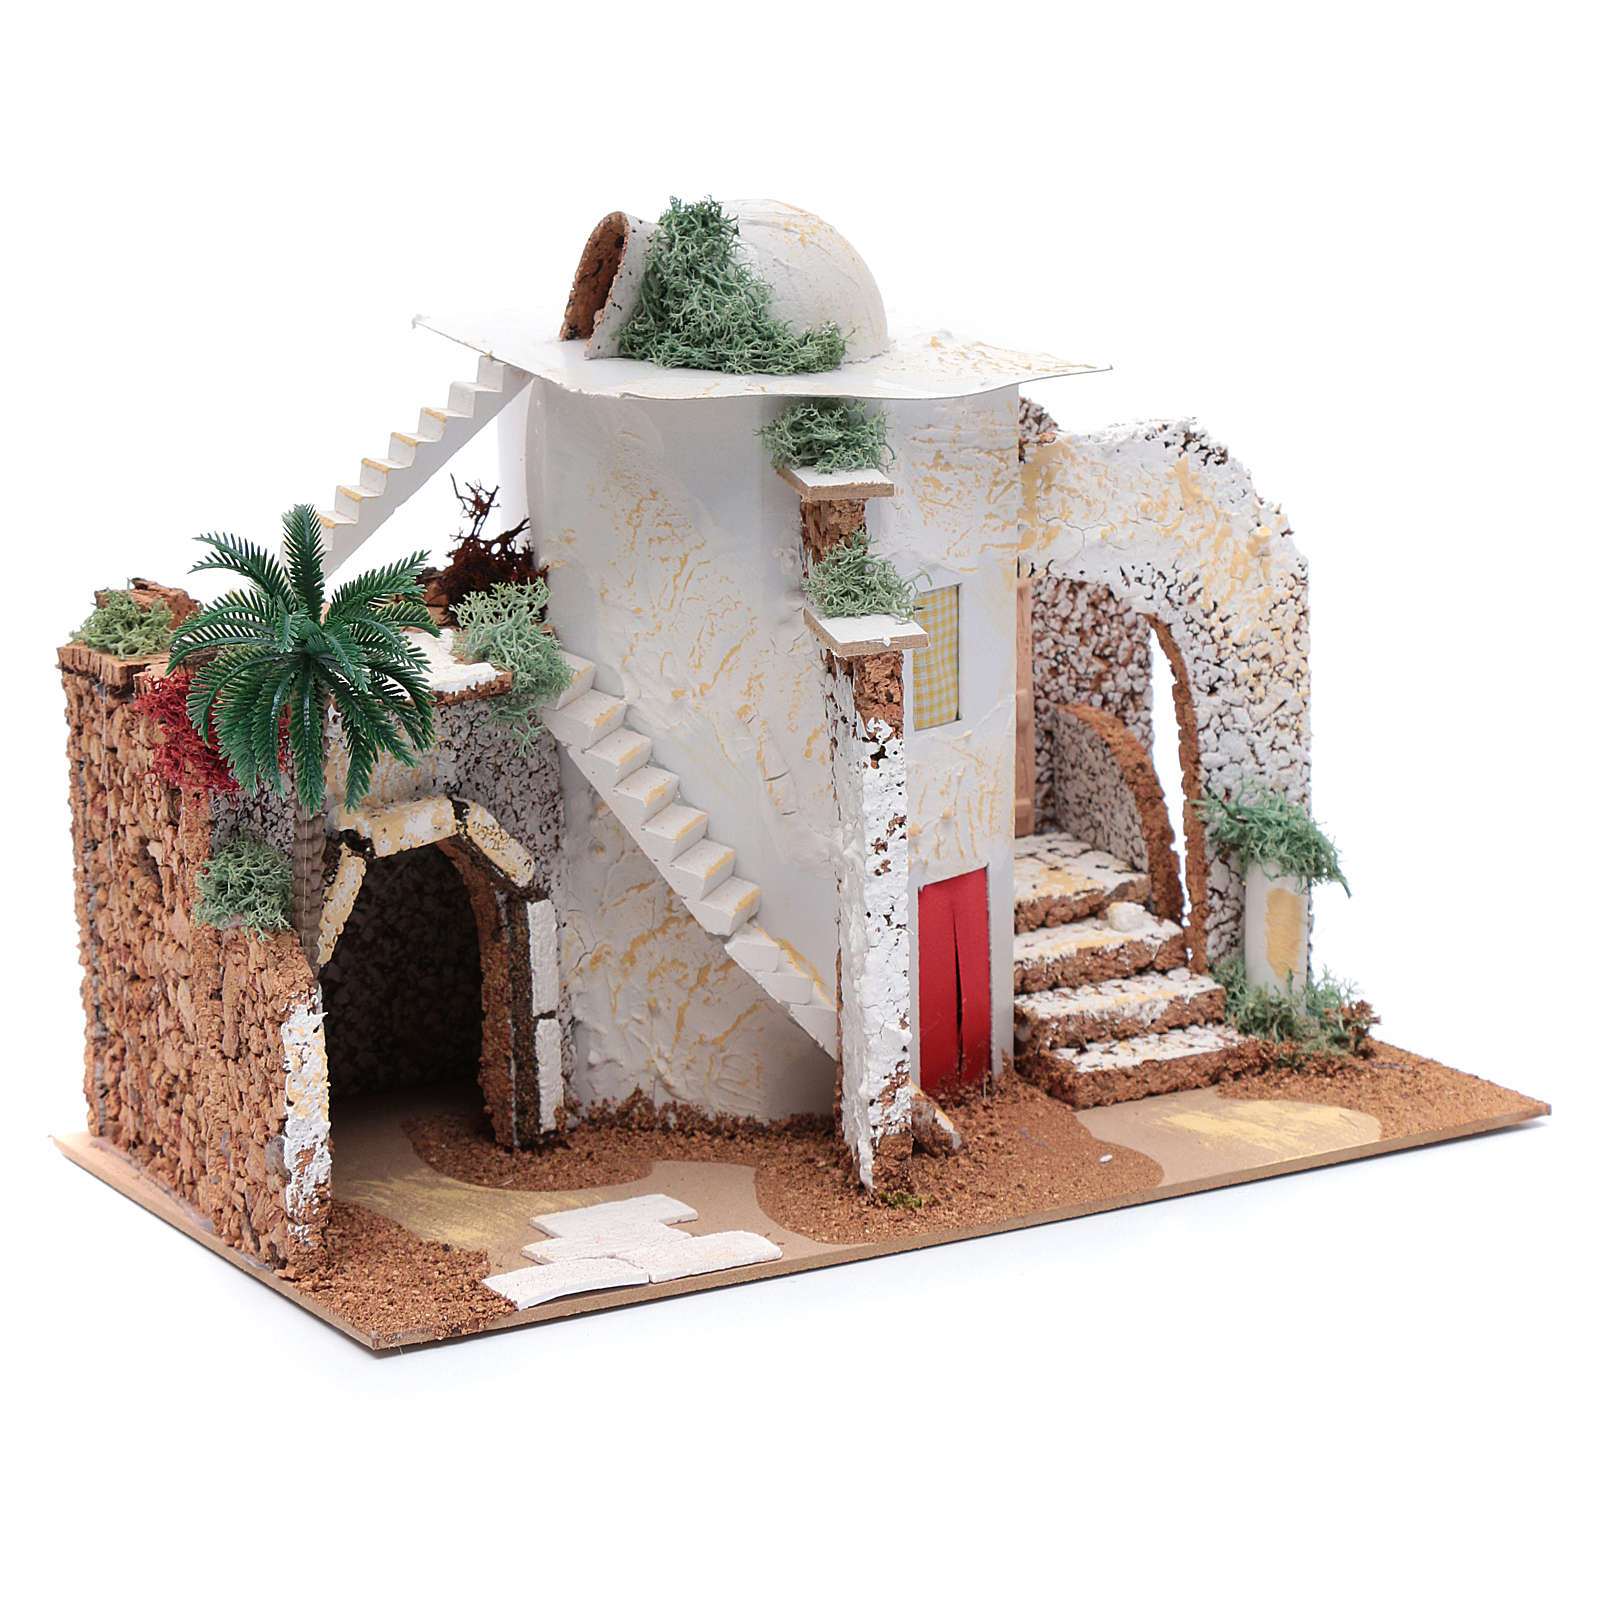 Casa árabe ambientación belén 25x33x15 cm 4